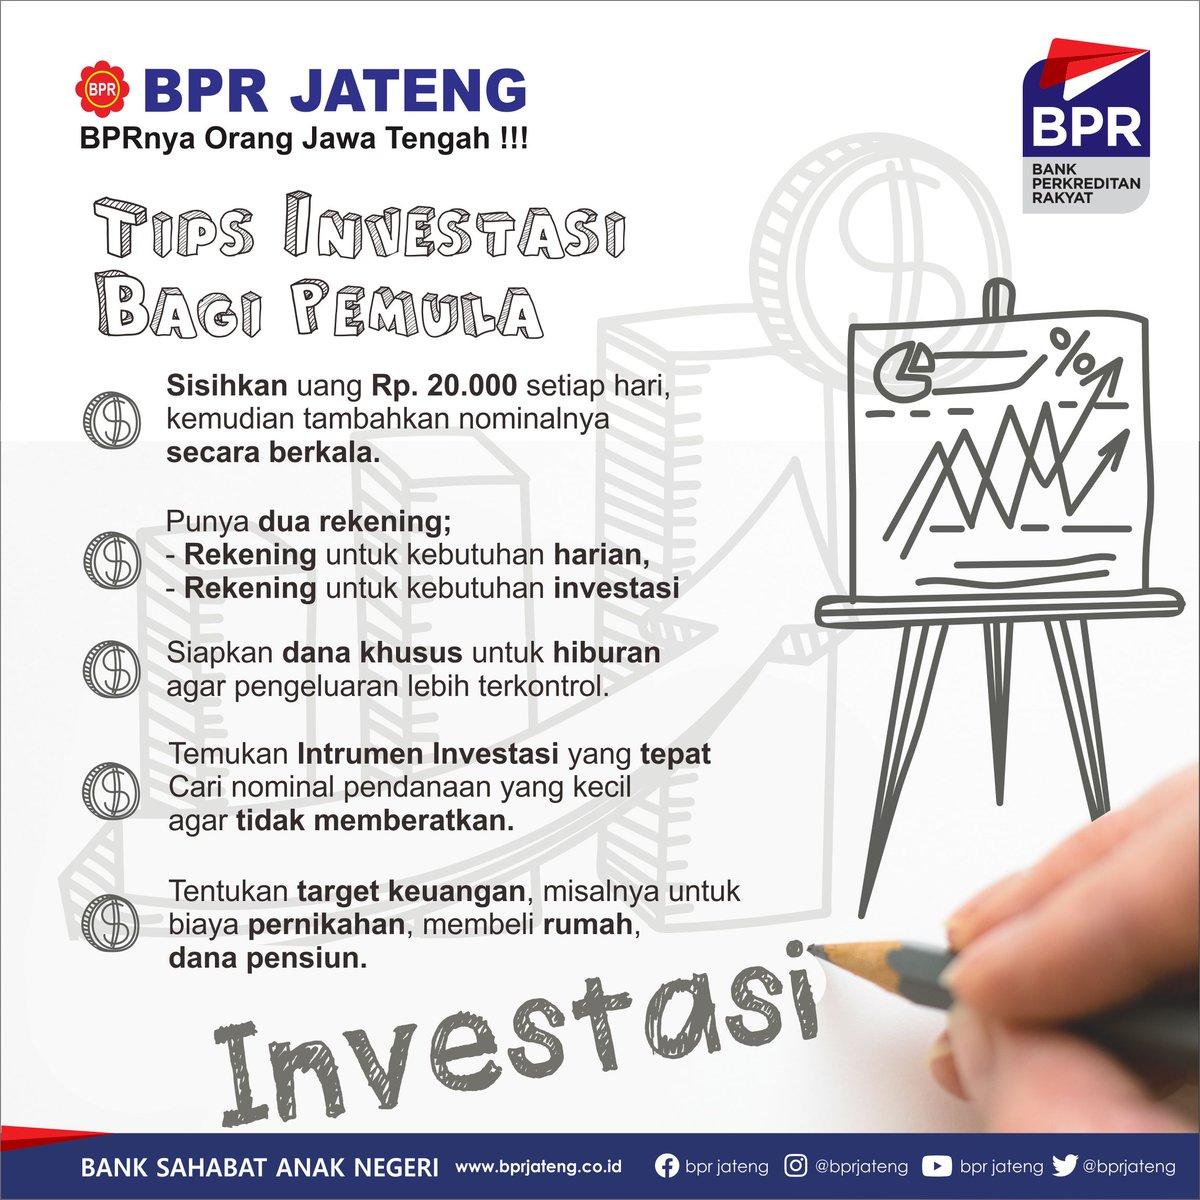 Berbagi Tips investasi ke masa depan yang lebih baik... semoga bermanfaat > > >  #investasi #tabungan #bprjateng #semarang #rumah #danapensiun #Indonesia #KreditCepat #kreditmudah #Kreditmurah #Semangat #finance #jatenggayeng #jateng #jawatengah #bank #bpr #bankperkreditanrakyatpic.twitter.com/PDXZrY8lW4